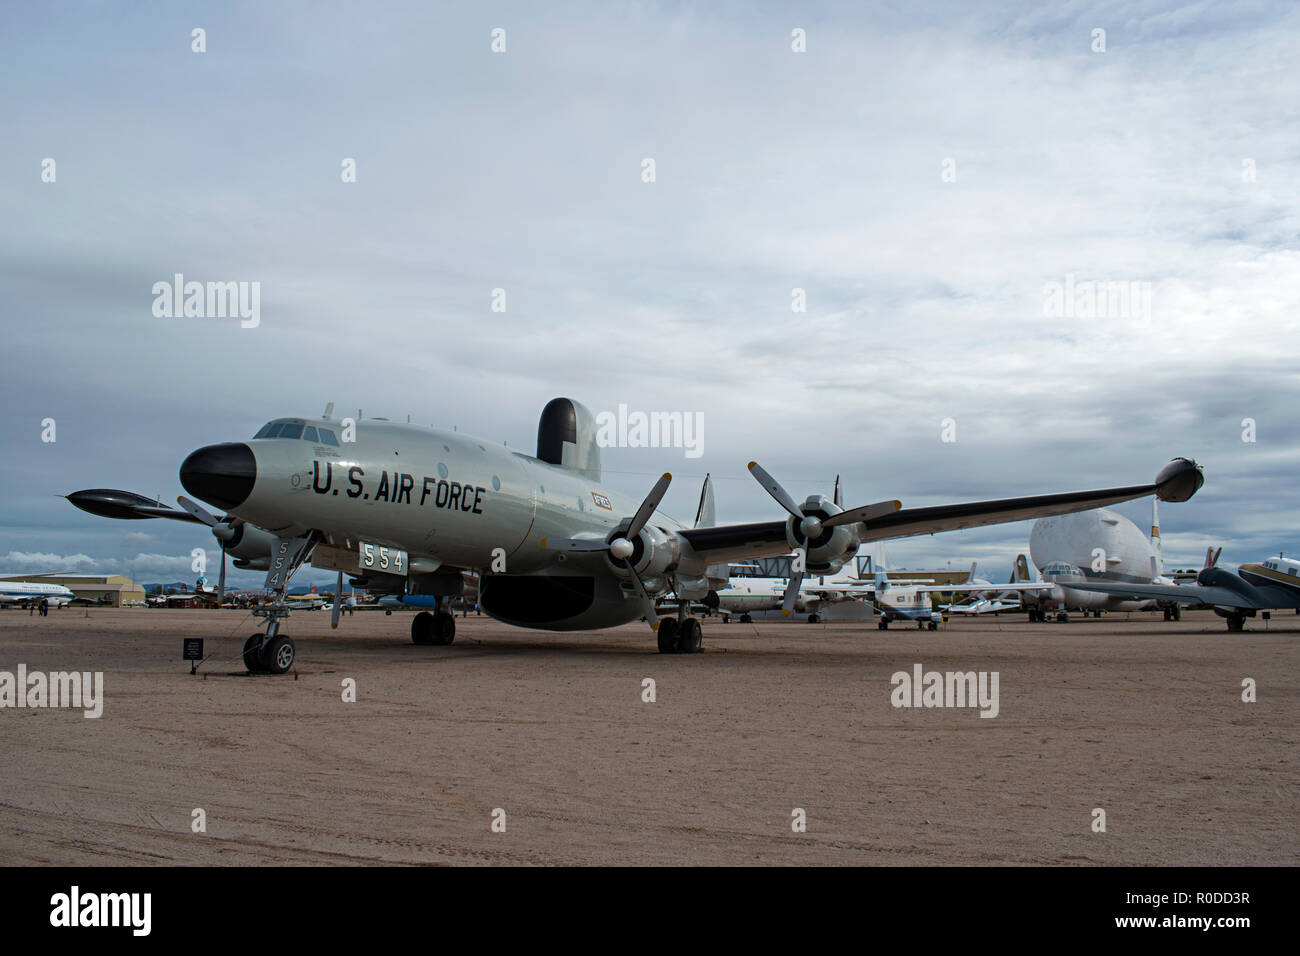 Eg-121 Warnung Stern, Pima Air & Space Museum. Tucson Arizona. USA Stockfoto